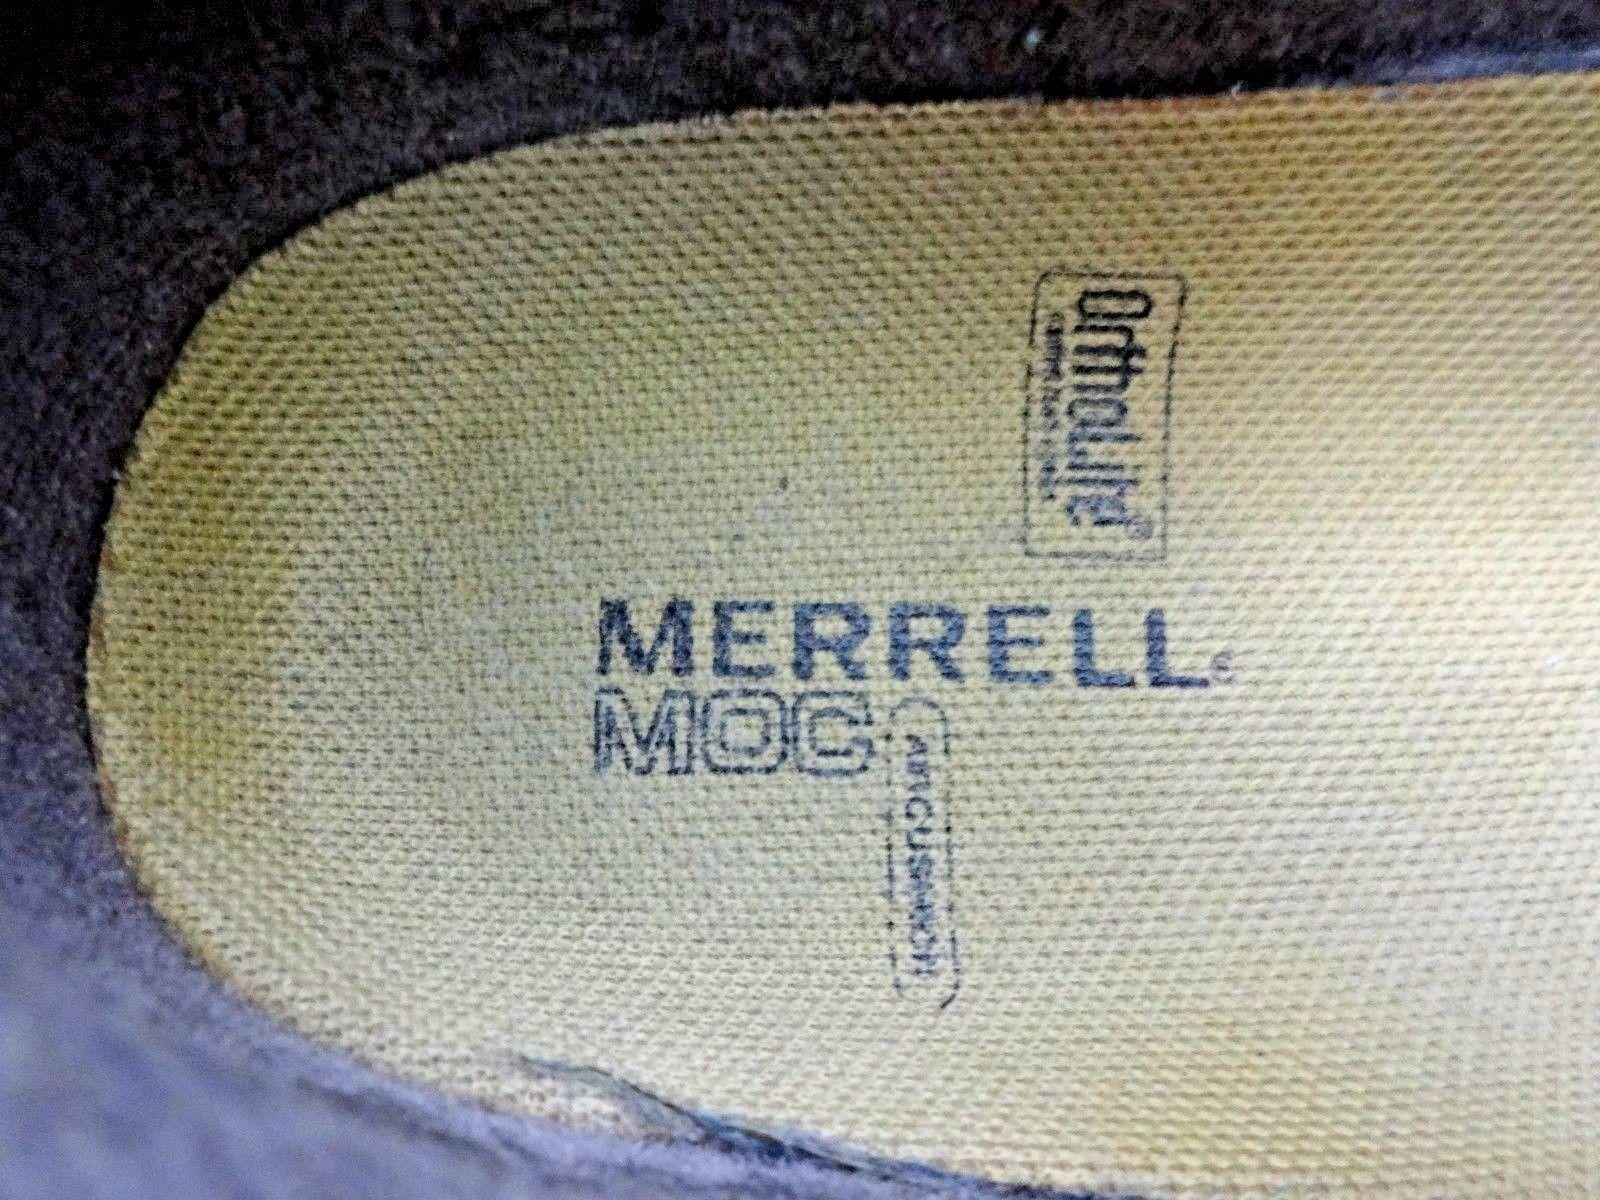 Merrell Bracken mocs brown leather clog loafer mule 8.5 wmns nubuck slip on Shoe